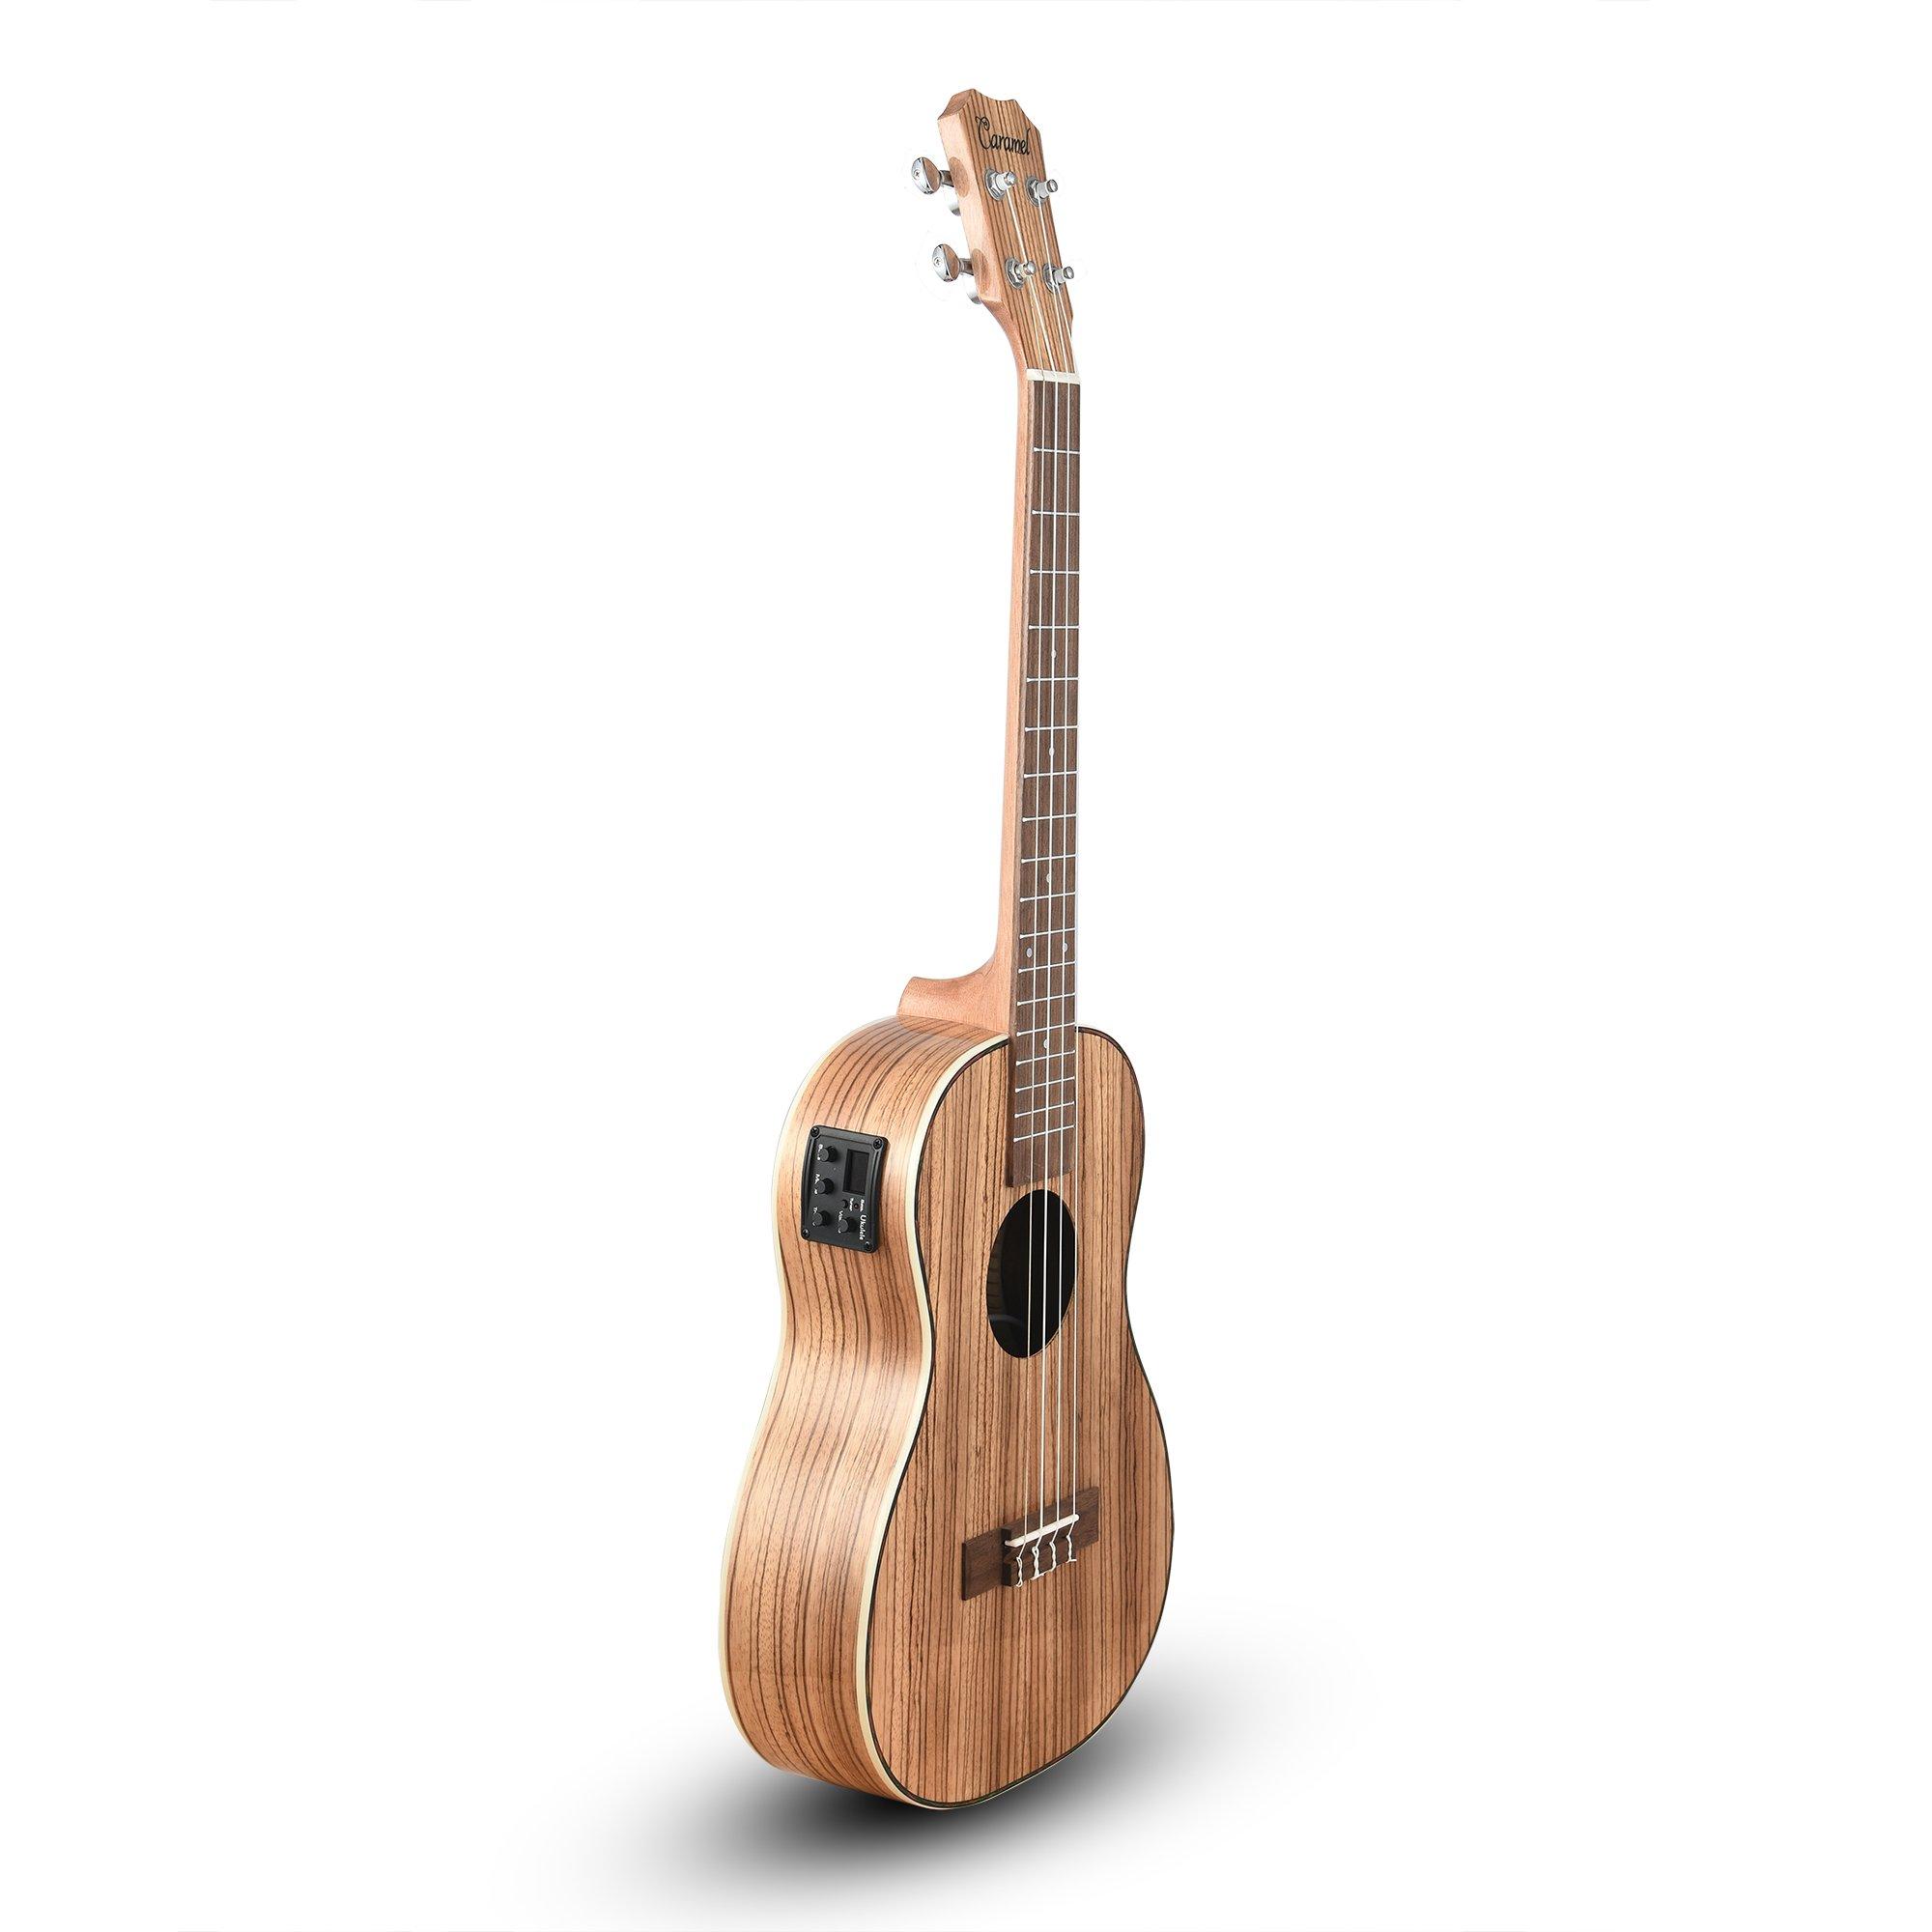 Caramel CB103 30 Inch High Gloss Zebra Wood Baritone Acoustic Electric Ukulele With Truss Rod